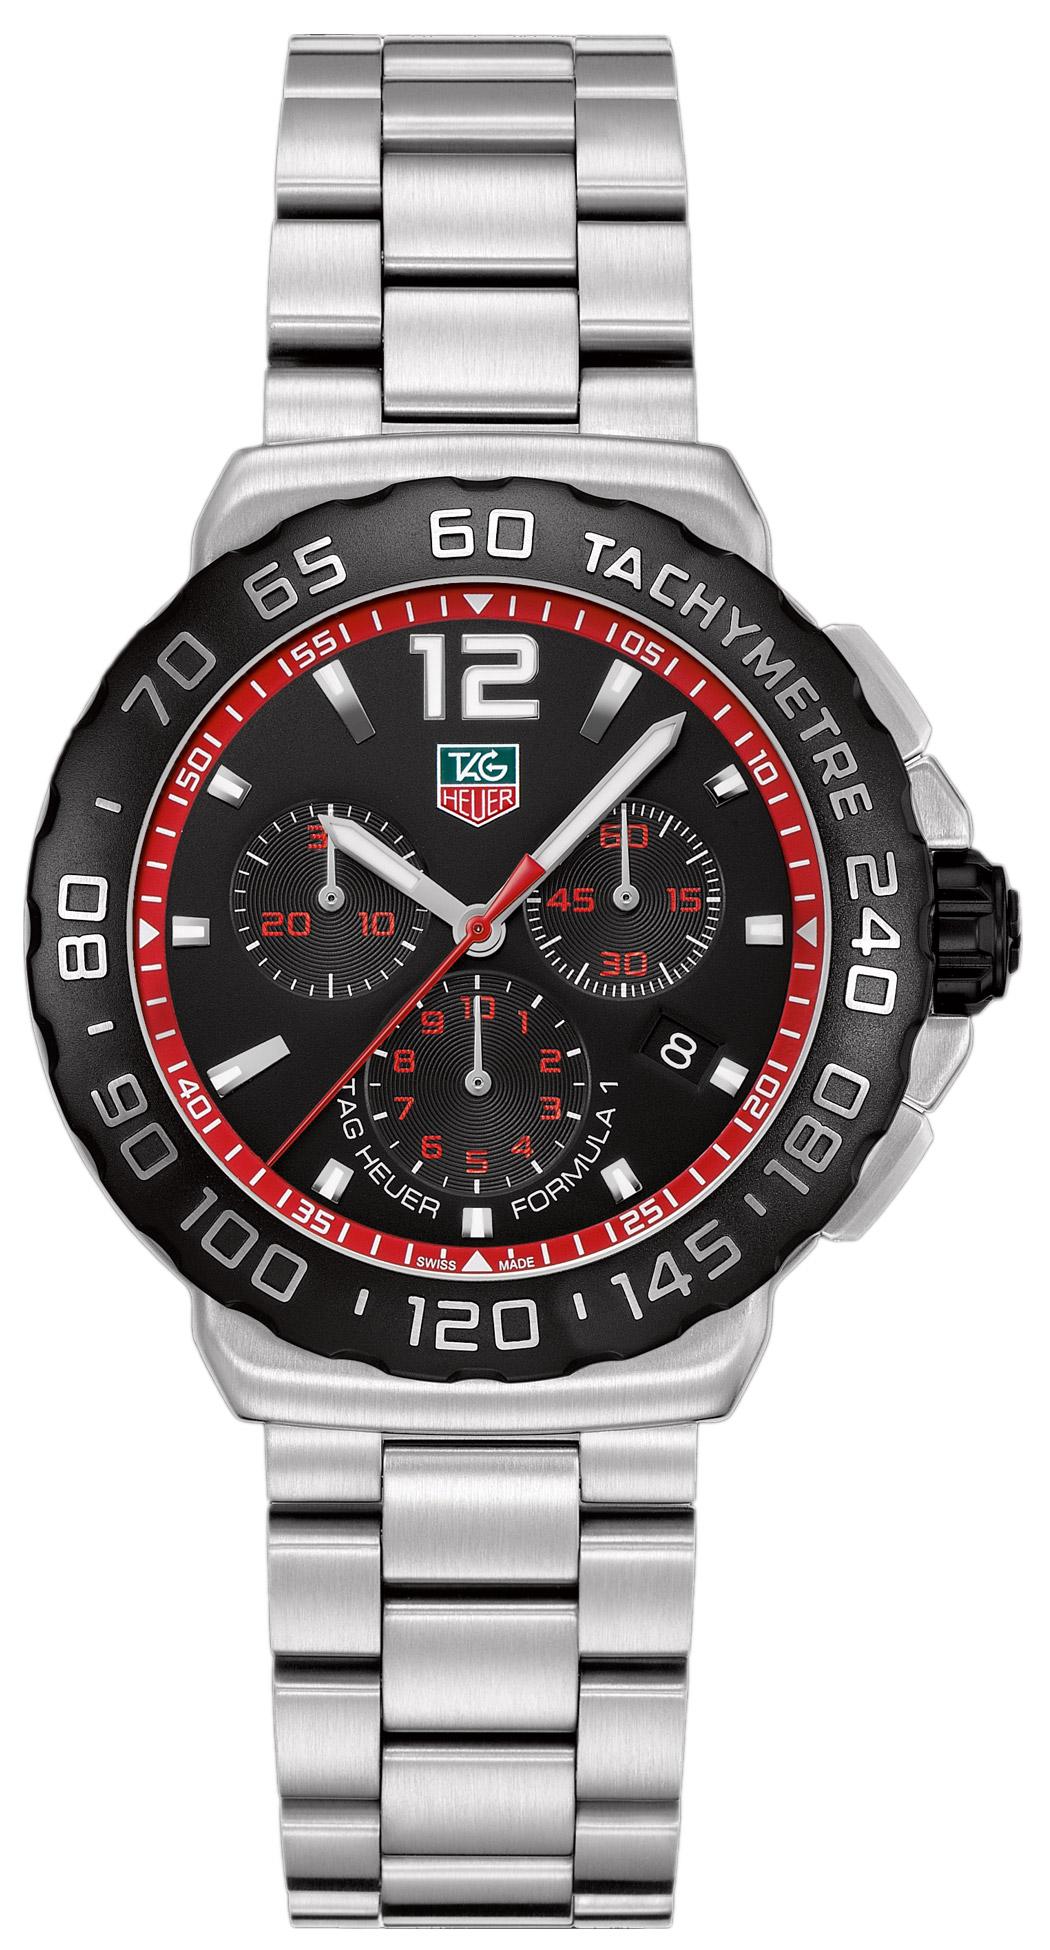 4664a6c13fbd4 Tag Heuer Formula 1 Chronograph 42mm Men s Watch Model  CAU1116.BA0858